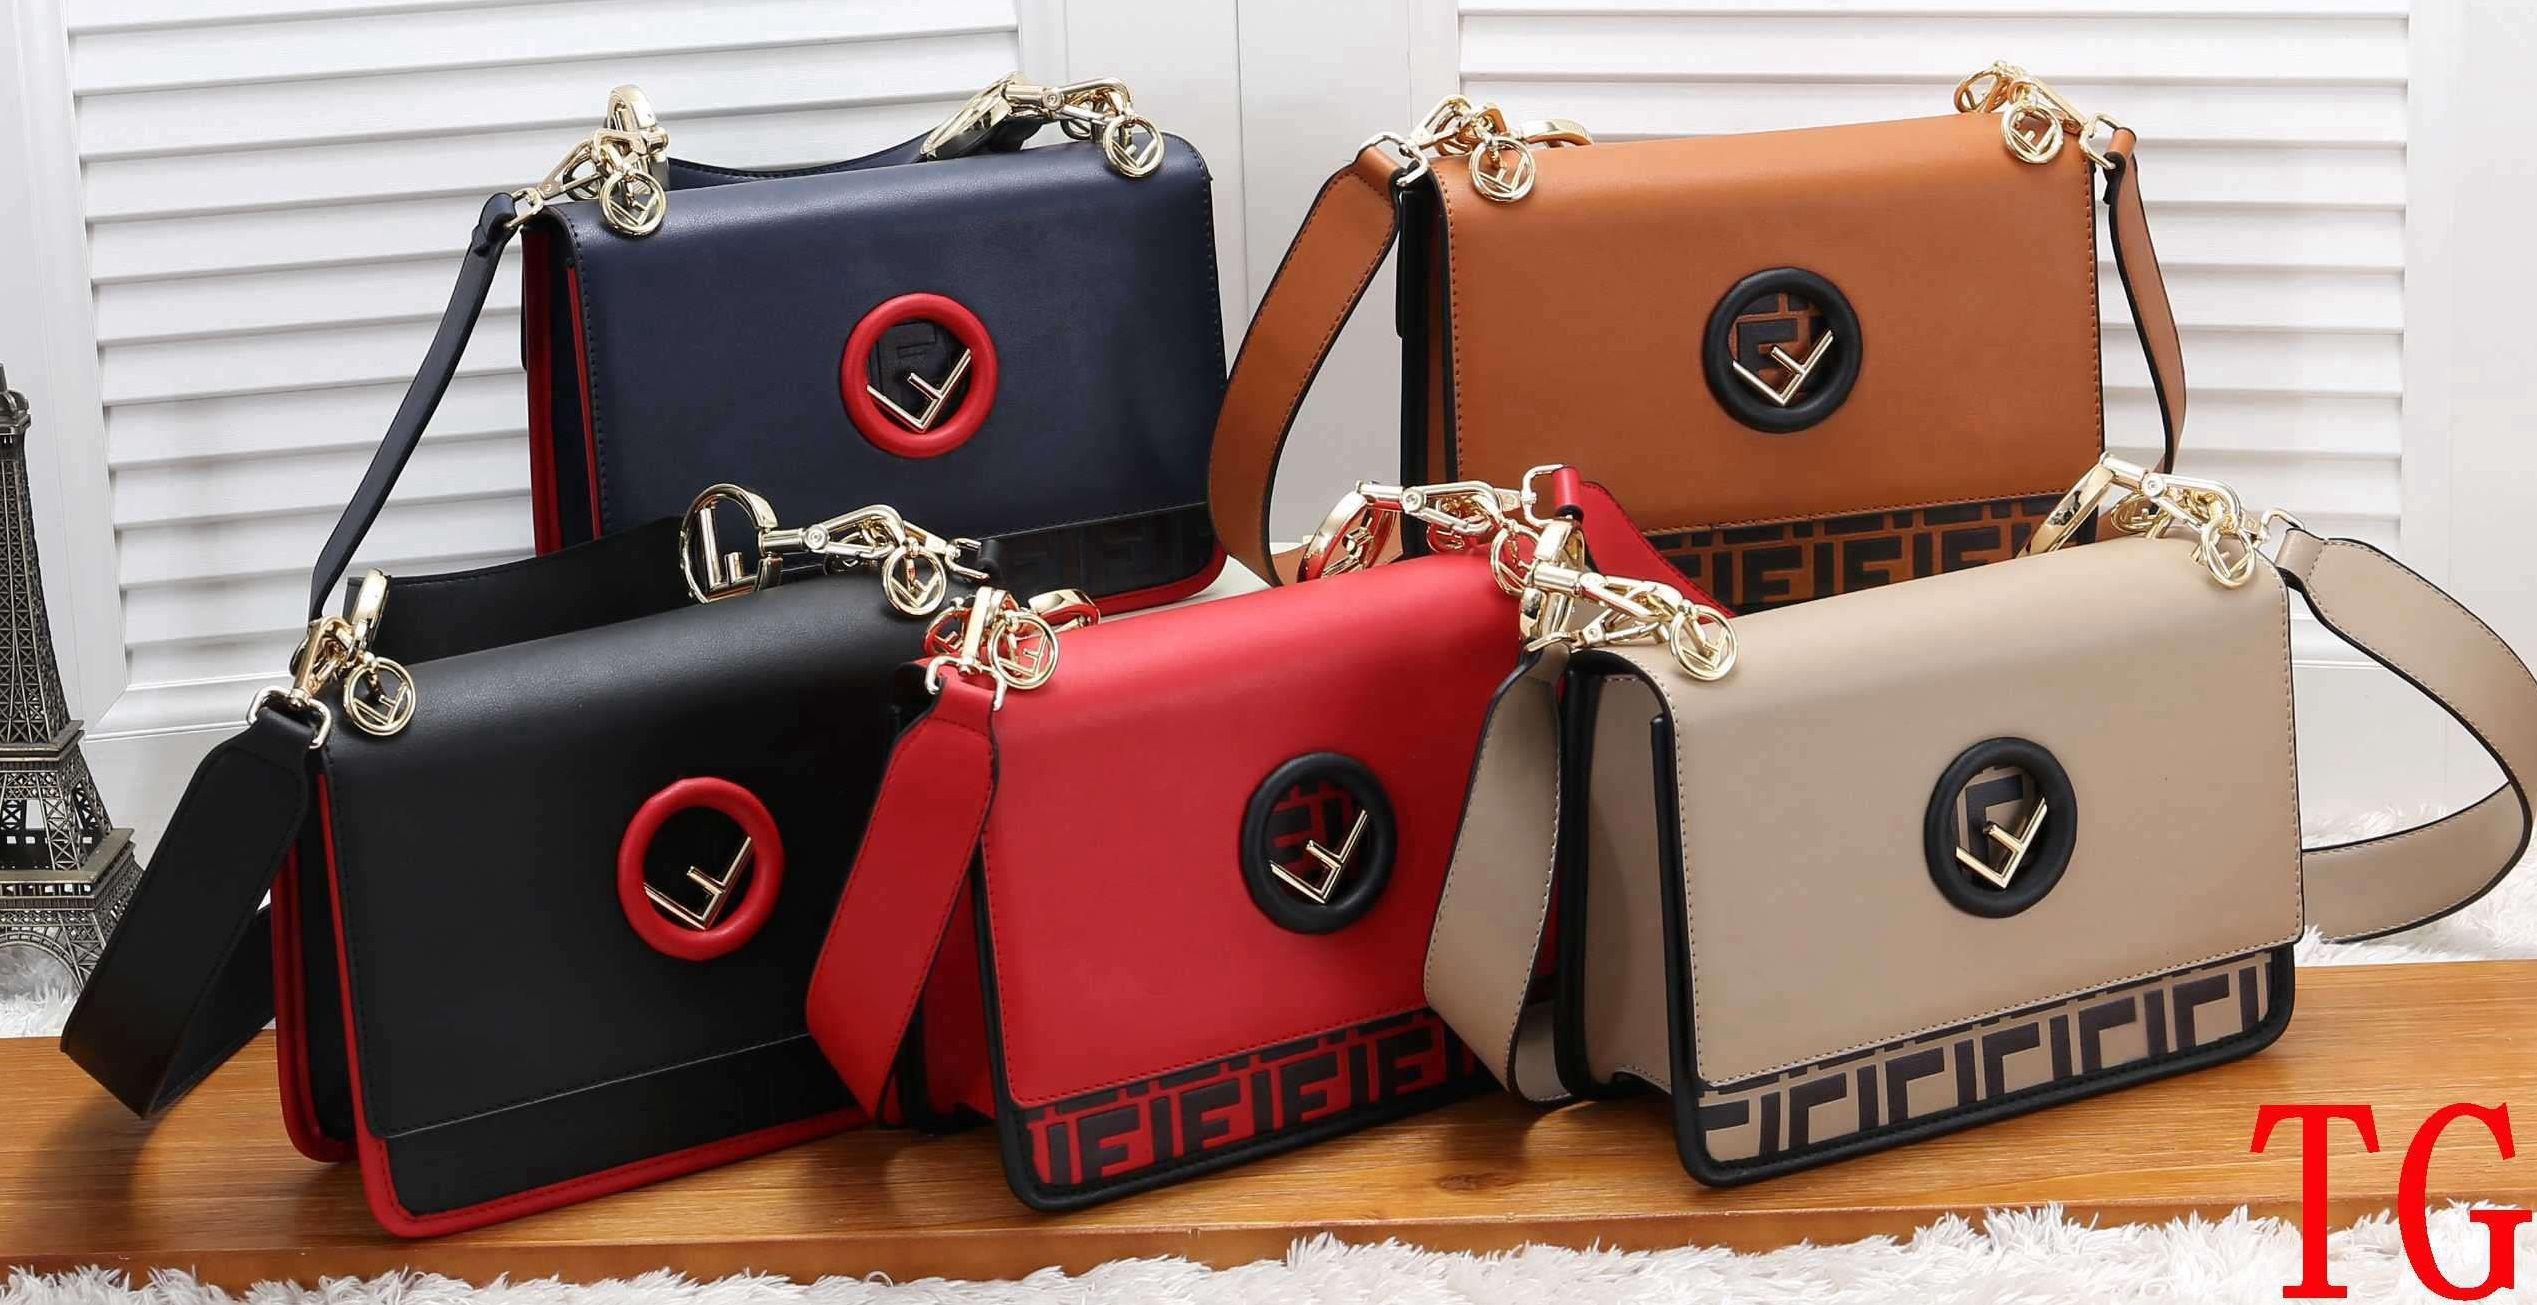 0c0ddaa50c34 2019 Luxury Double F Flap Shoulder Bags Designer Leather Shoulder Bags  Women Solid Color Leather Purse Leather Belts Crossbody Handbags Shoulder  Bags For ...